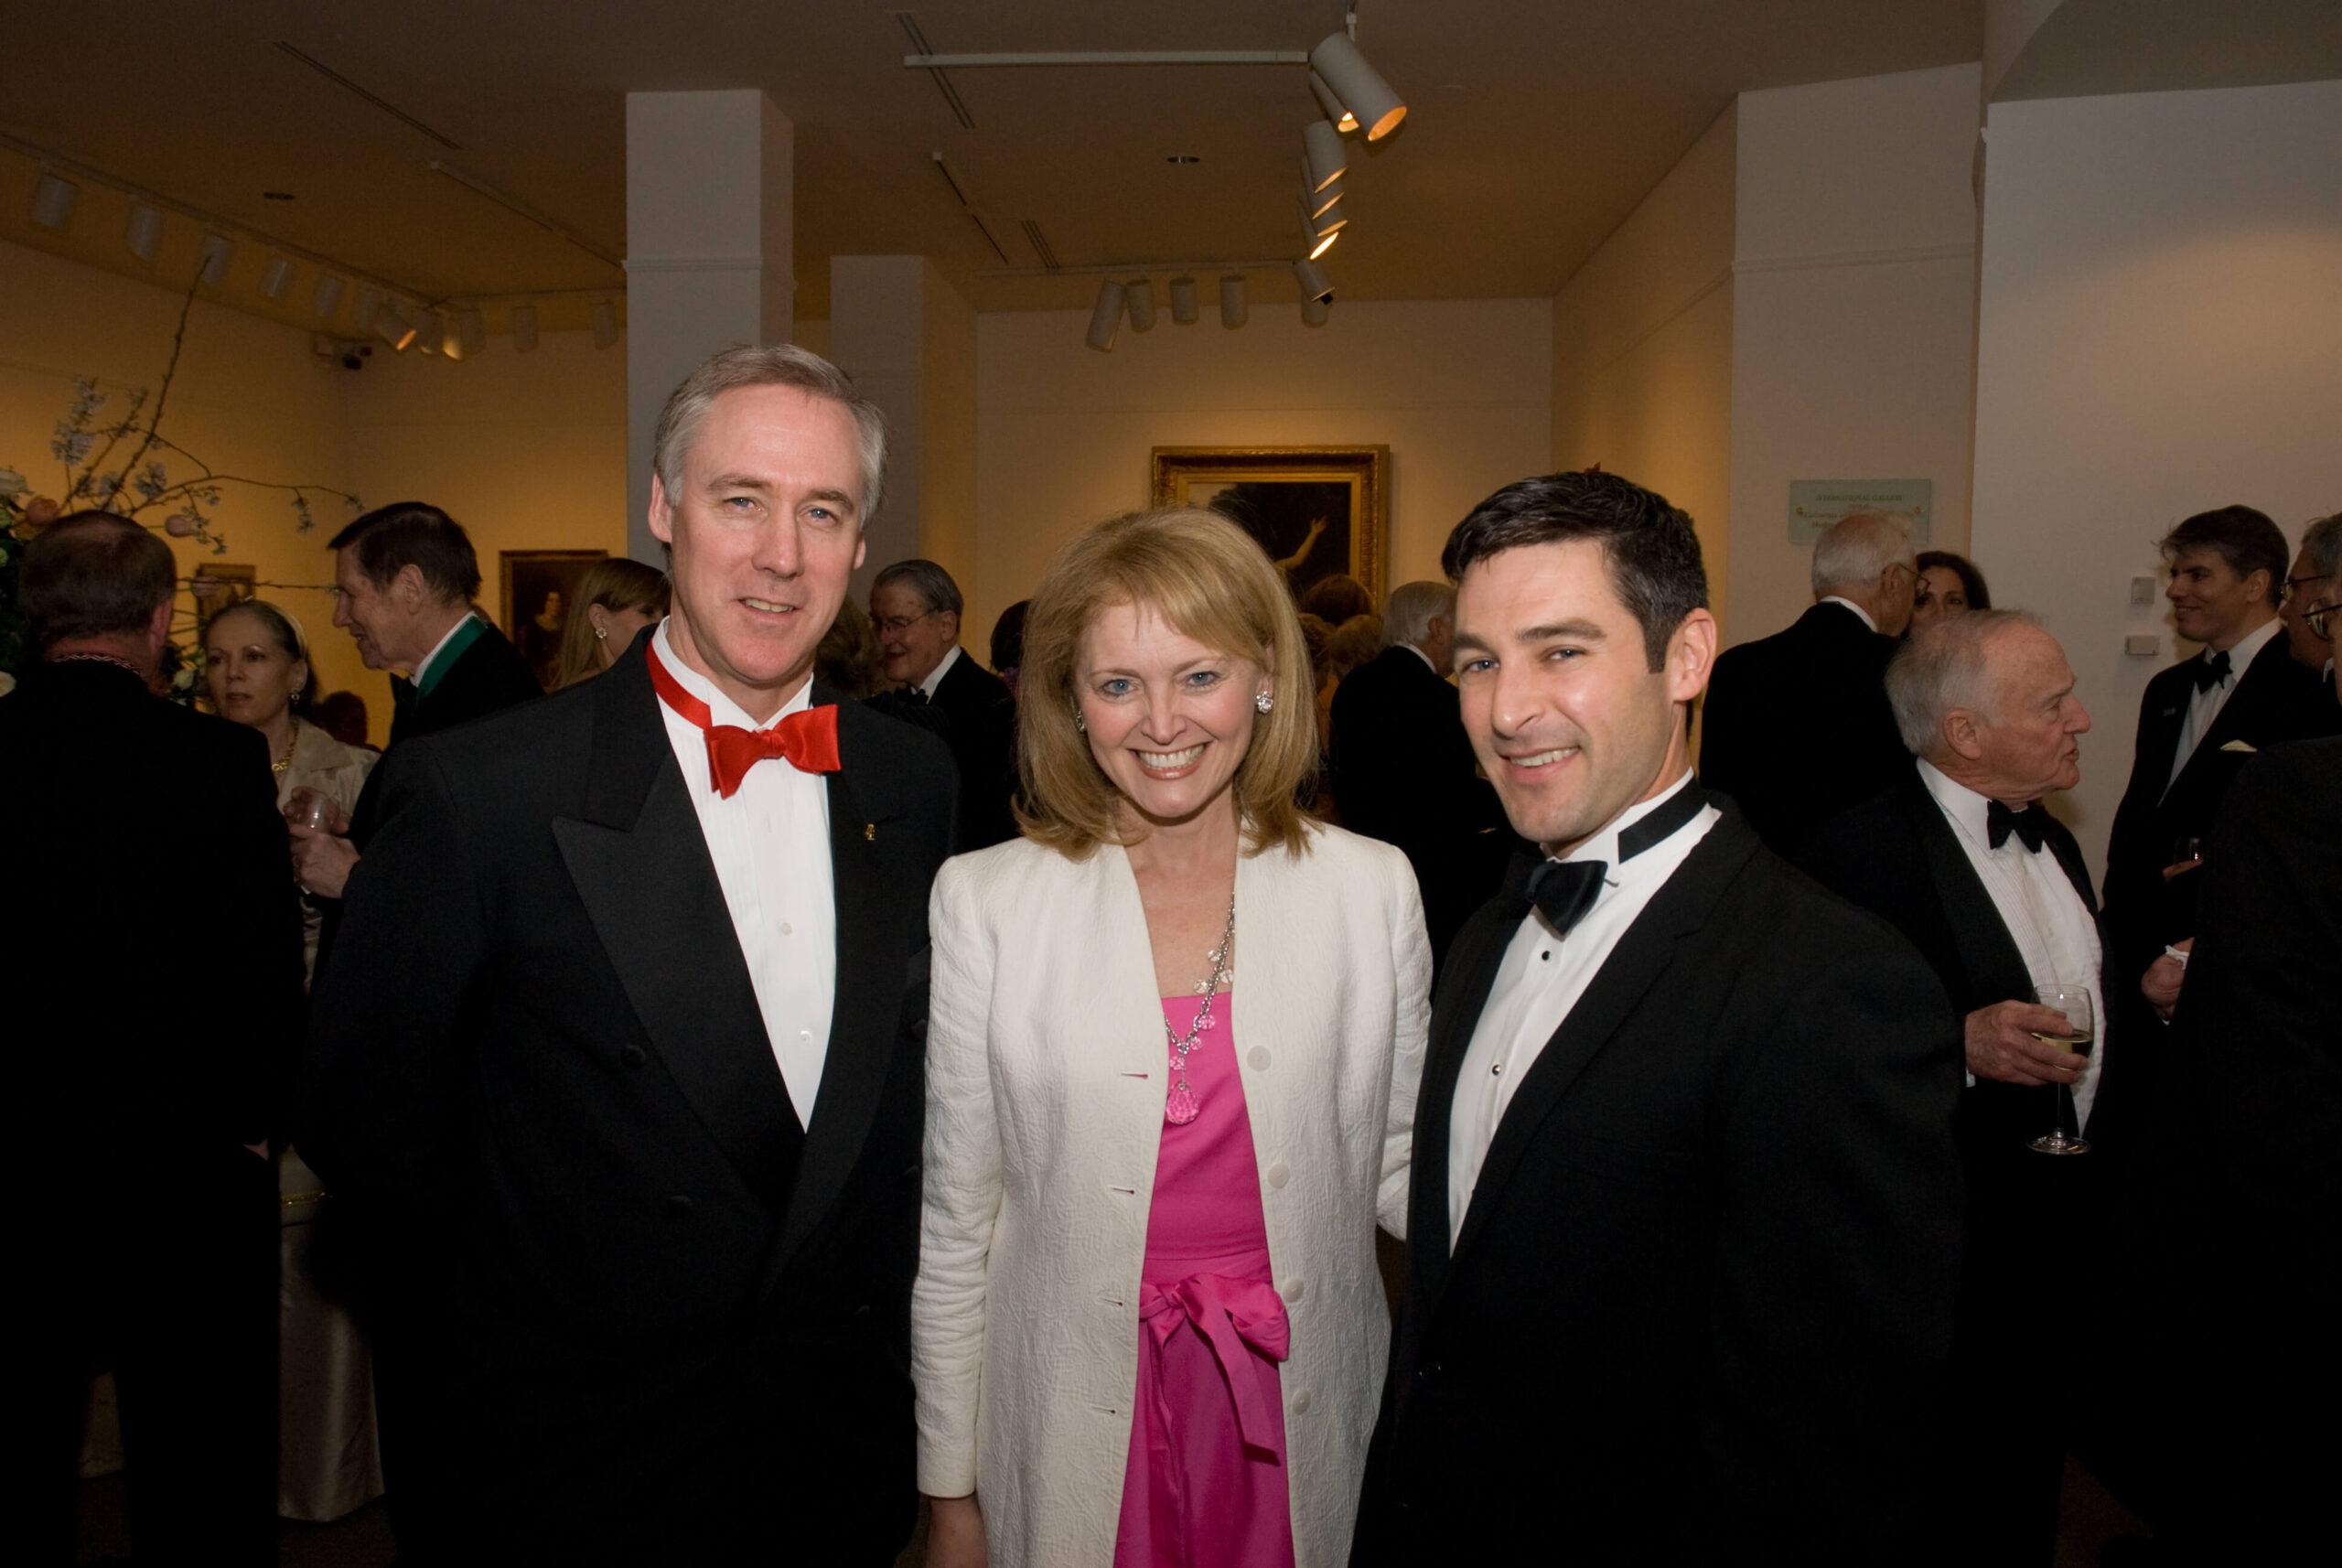 Ambasador Richard Swett, Mrs. Katrina Lantos-Swett, Mr. Damon Wilson